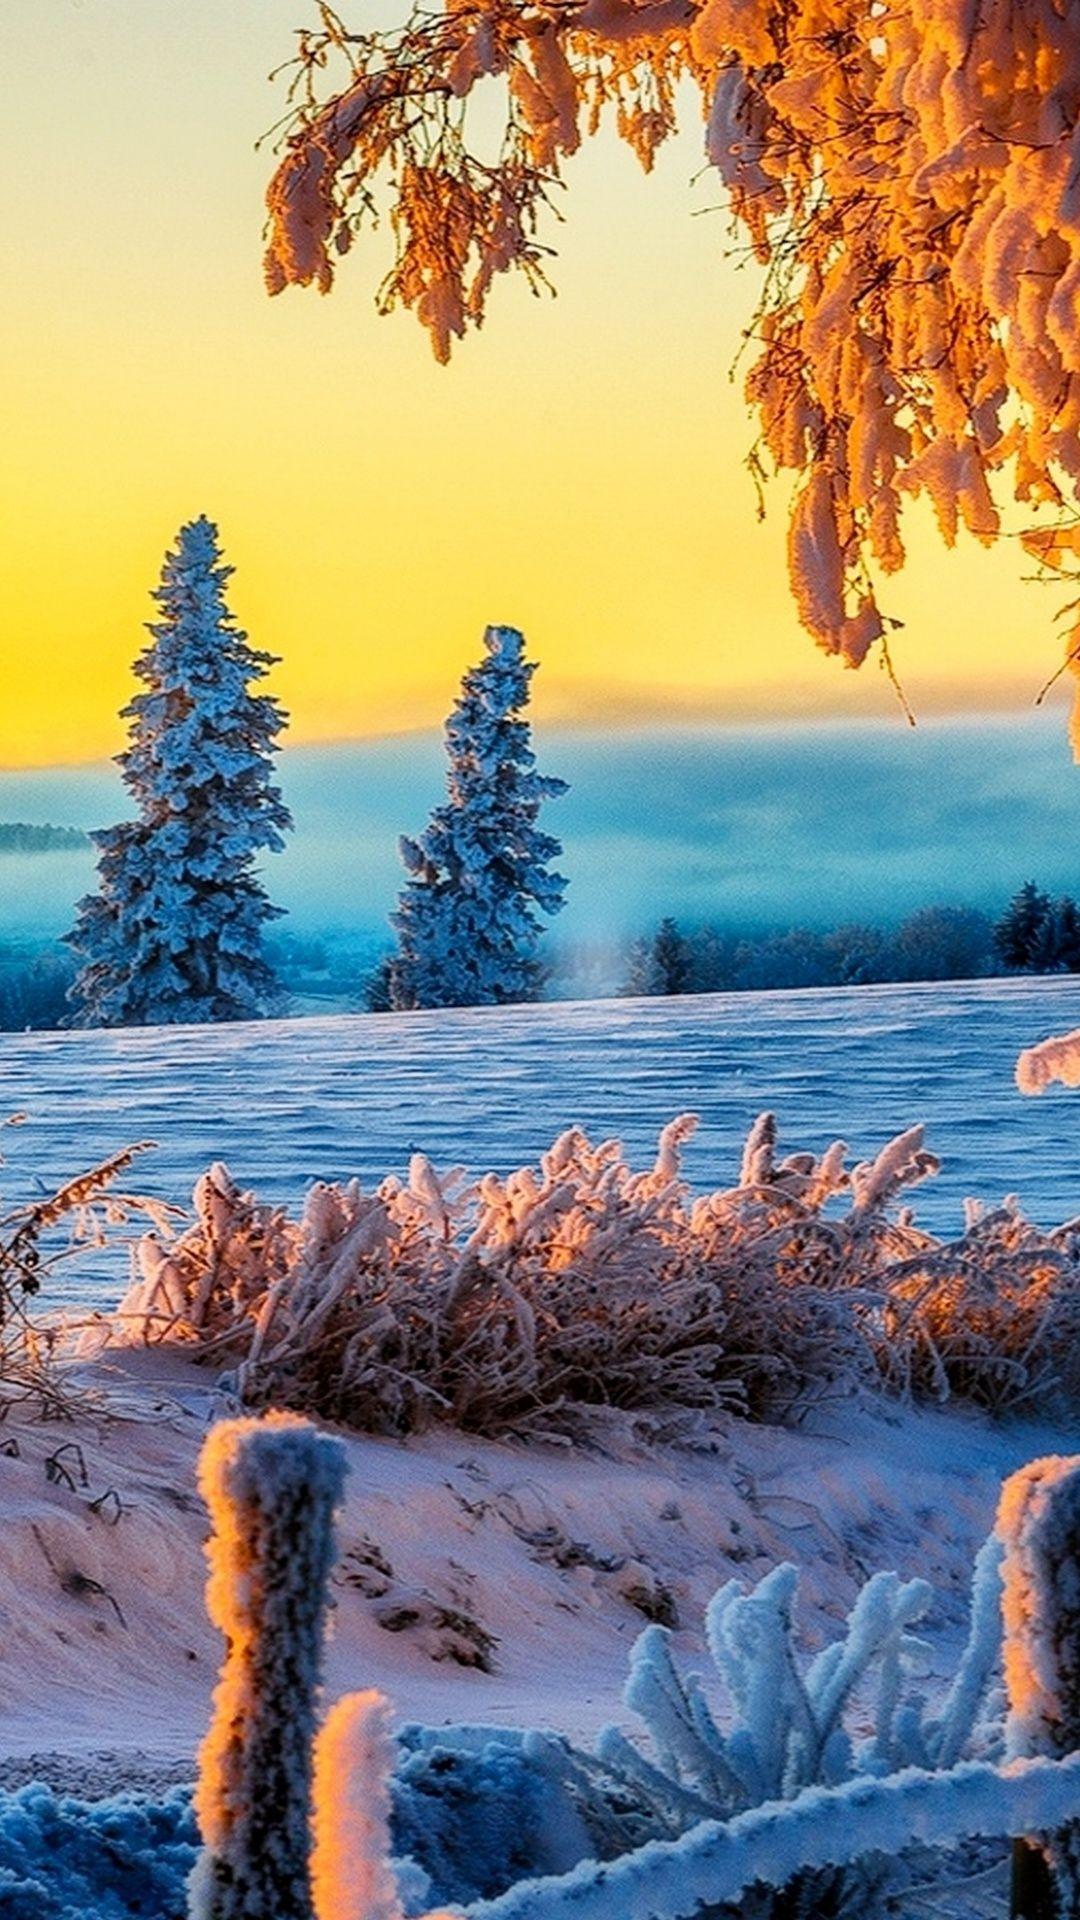 Wallpaper 3840 2160 Winter Tree 4k Sunrise Wallpaper Nature Wallpaper Winter Sunrise